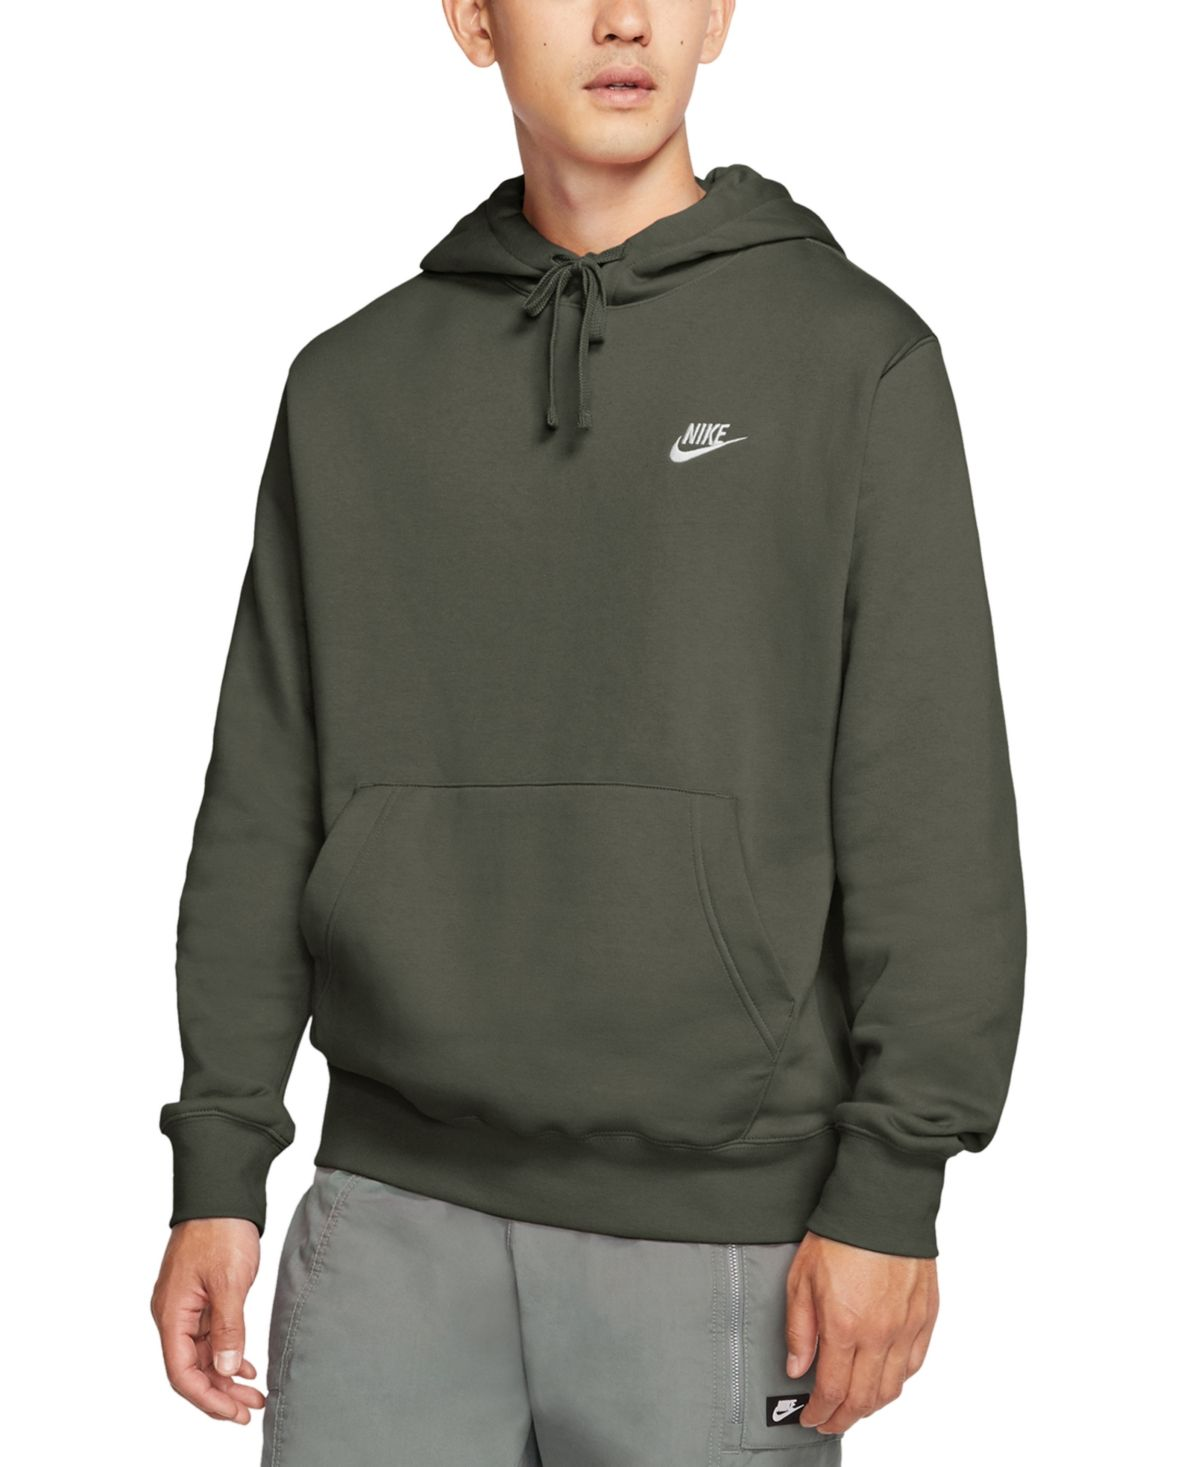 Nike Men S Sportswear Club Fleece Pullover Hoodie Reviews All Activewear Men Macy S In 2021 Mens Sweatshirts Hoodie Mens Sportswear Hoodies [ 1467 x 1200 Pixel ]